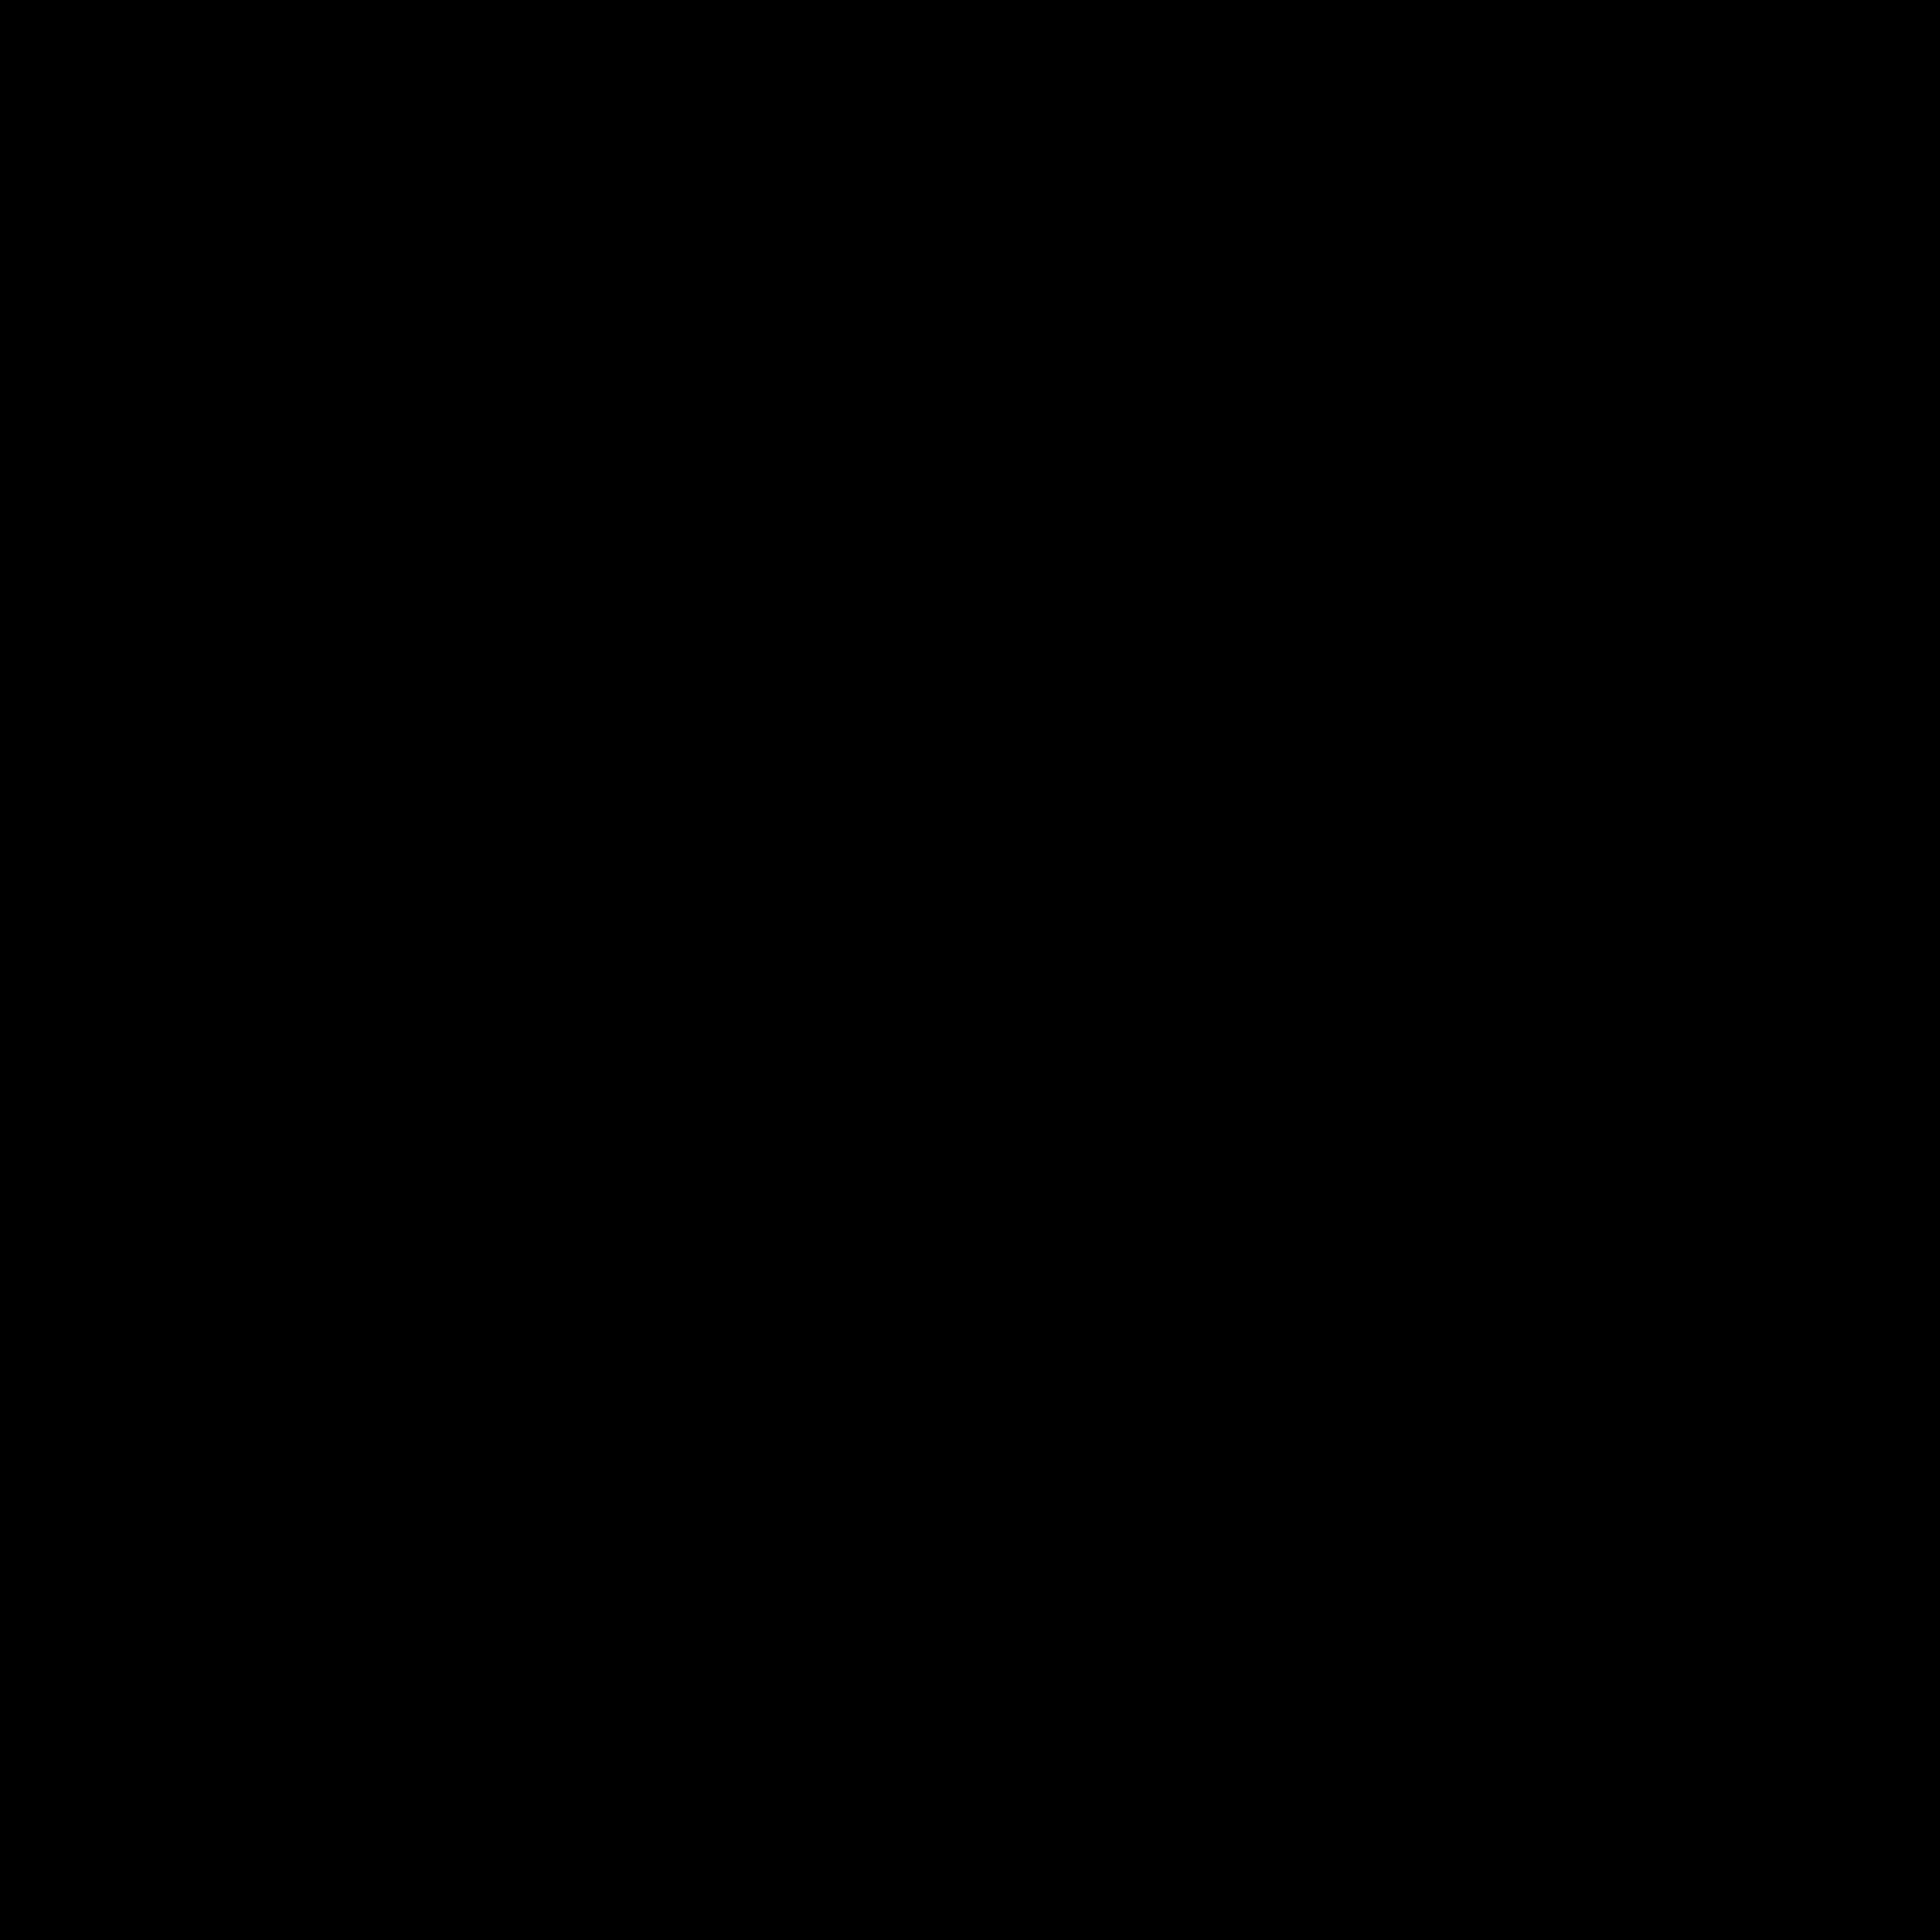 UEFA Champions League Logo PNG Transparent & SVG Vector ...